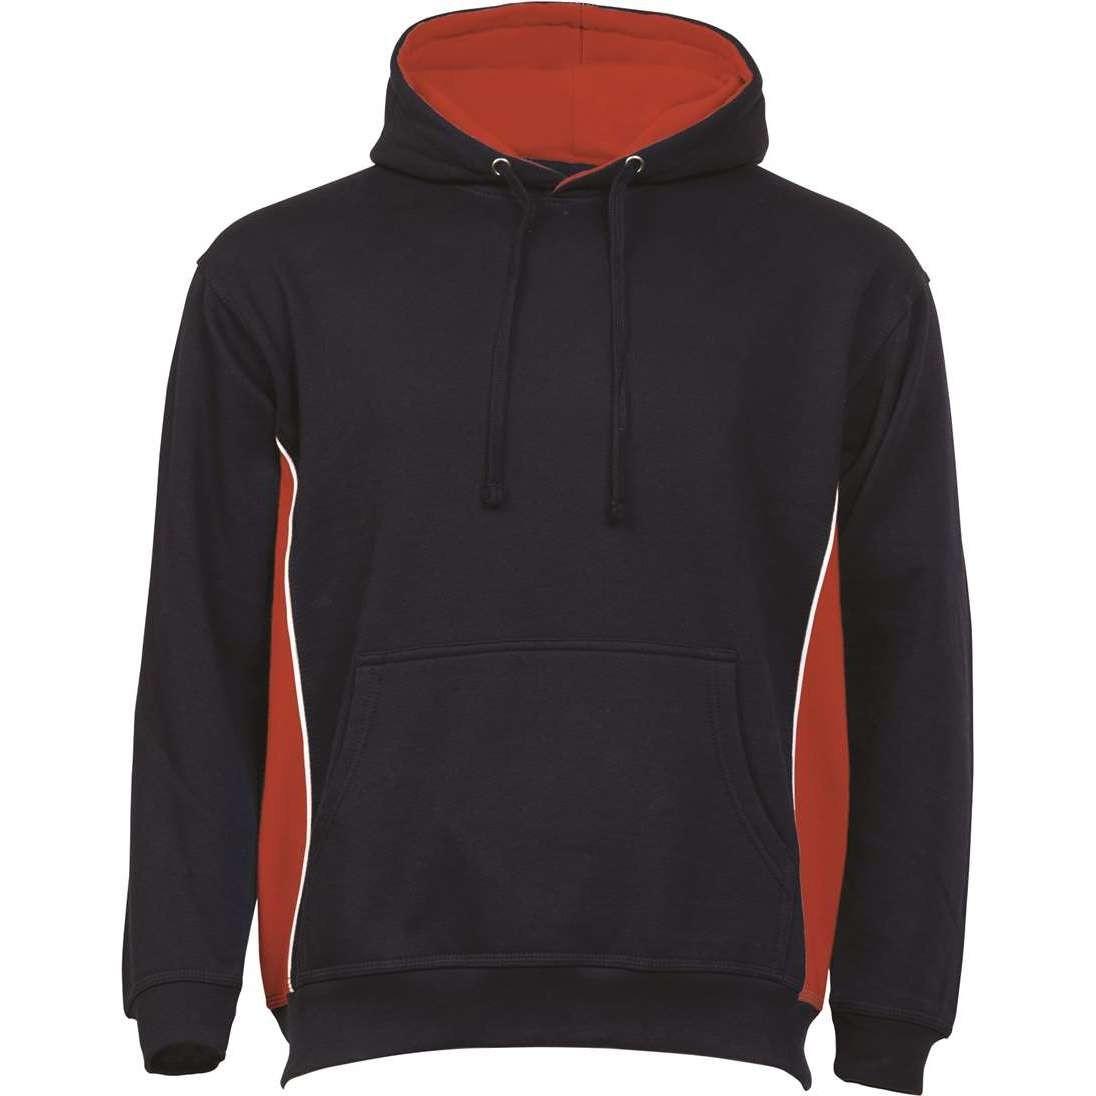 Sportstone Two Colour Hooded Sweatshirt